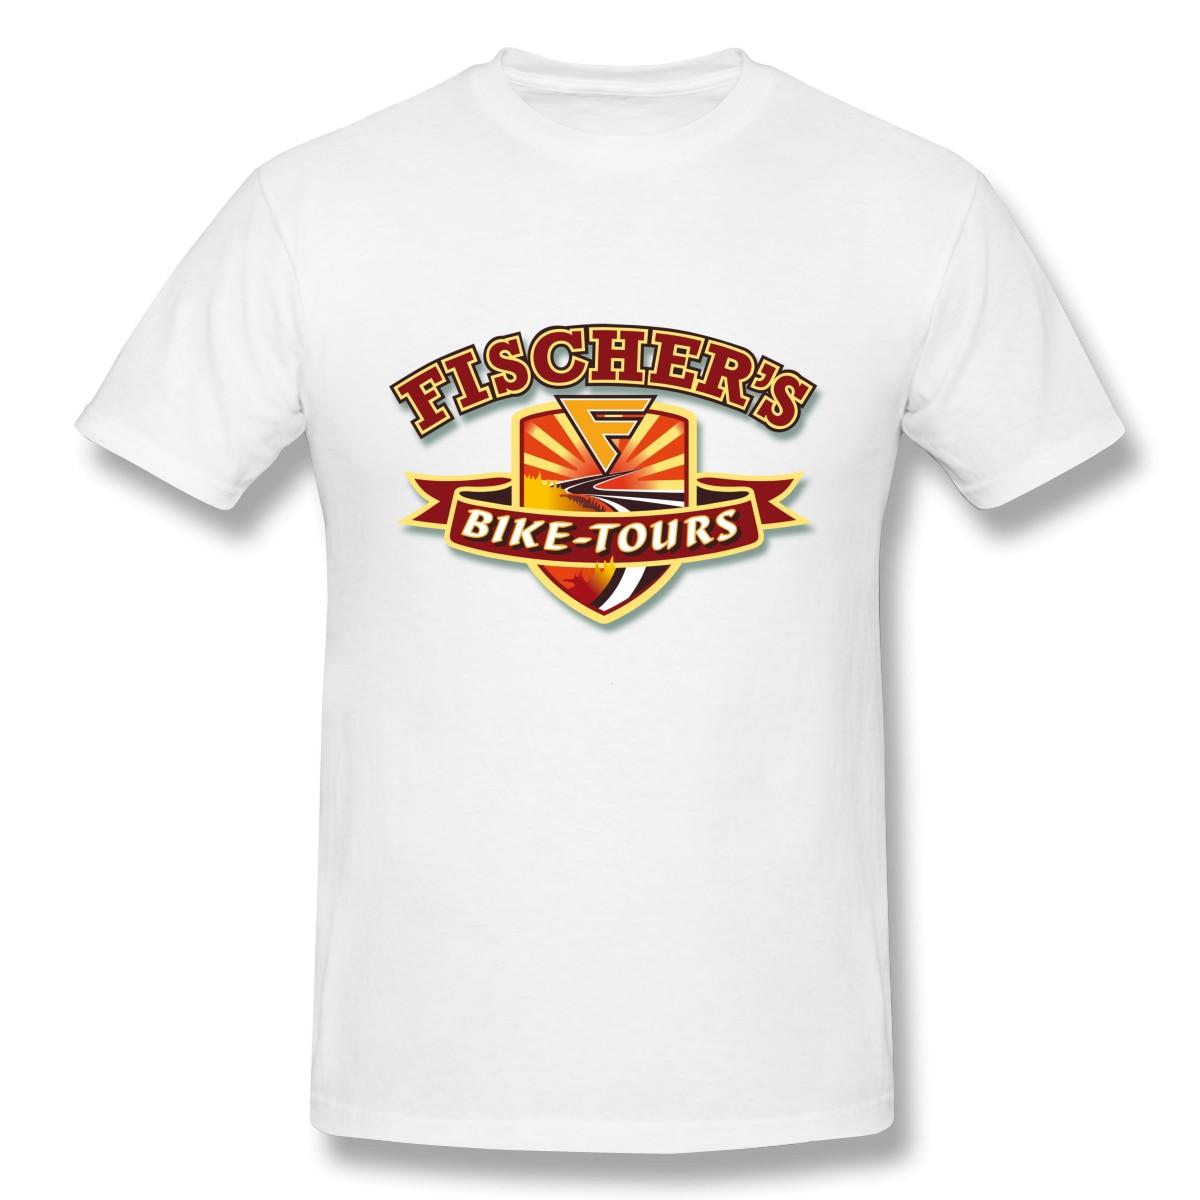 Camiseta harley-davidson, Camiseta de algodón de manga corta de Fisher, camiseta para viajes en bicicleta 4XL 5XL 6XL